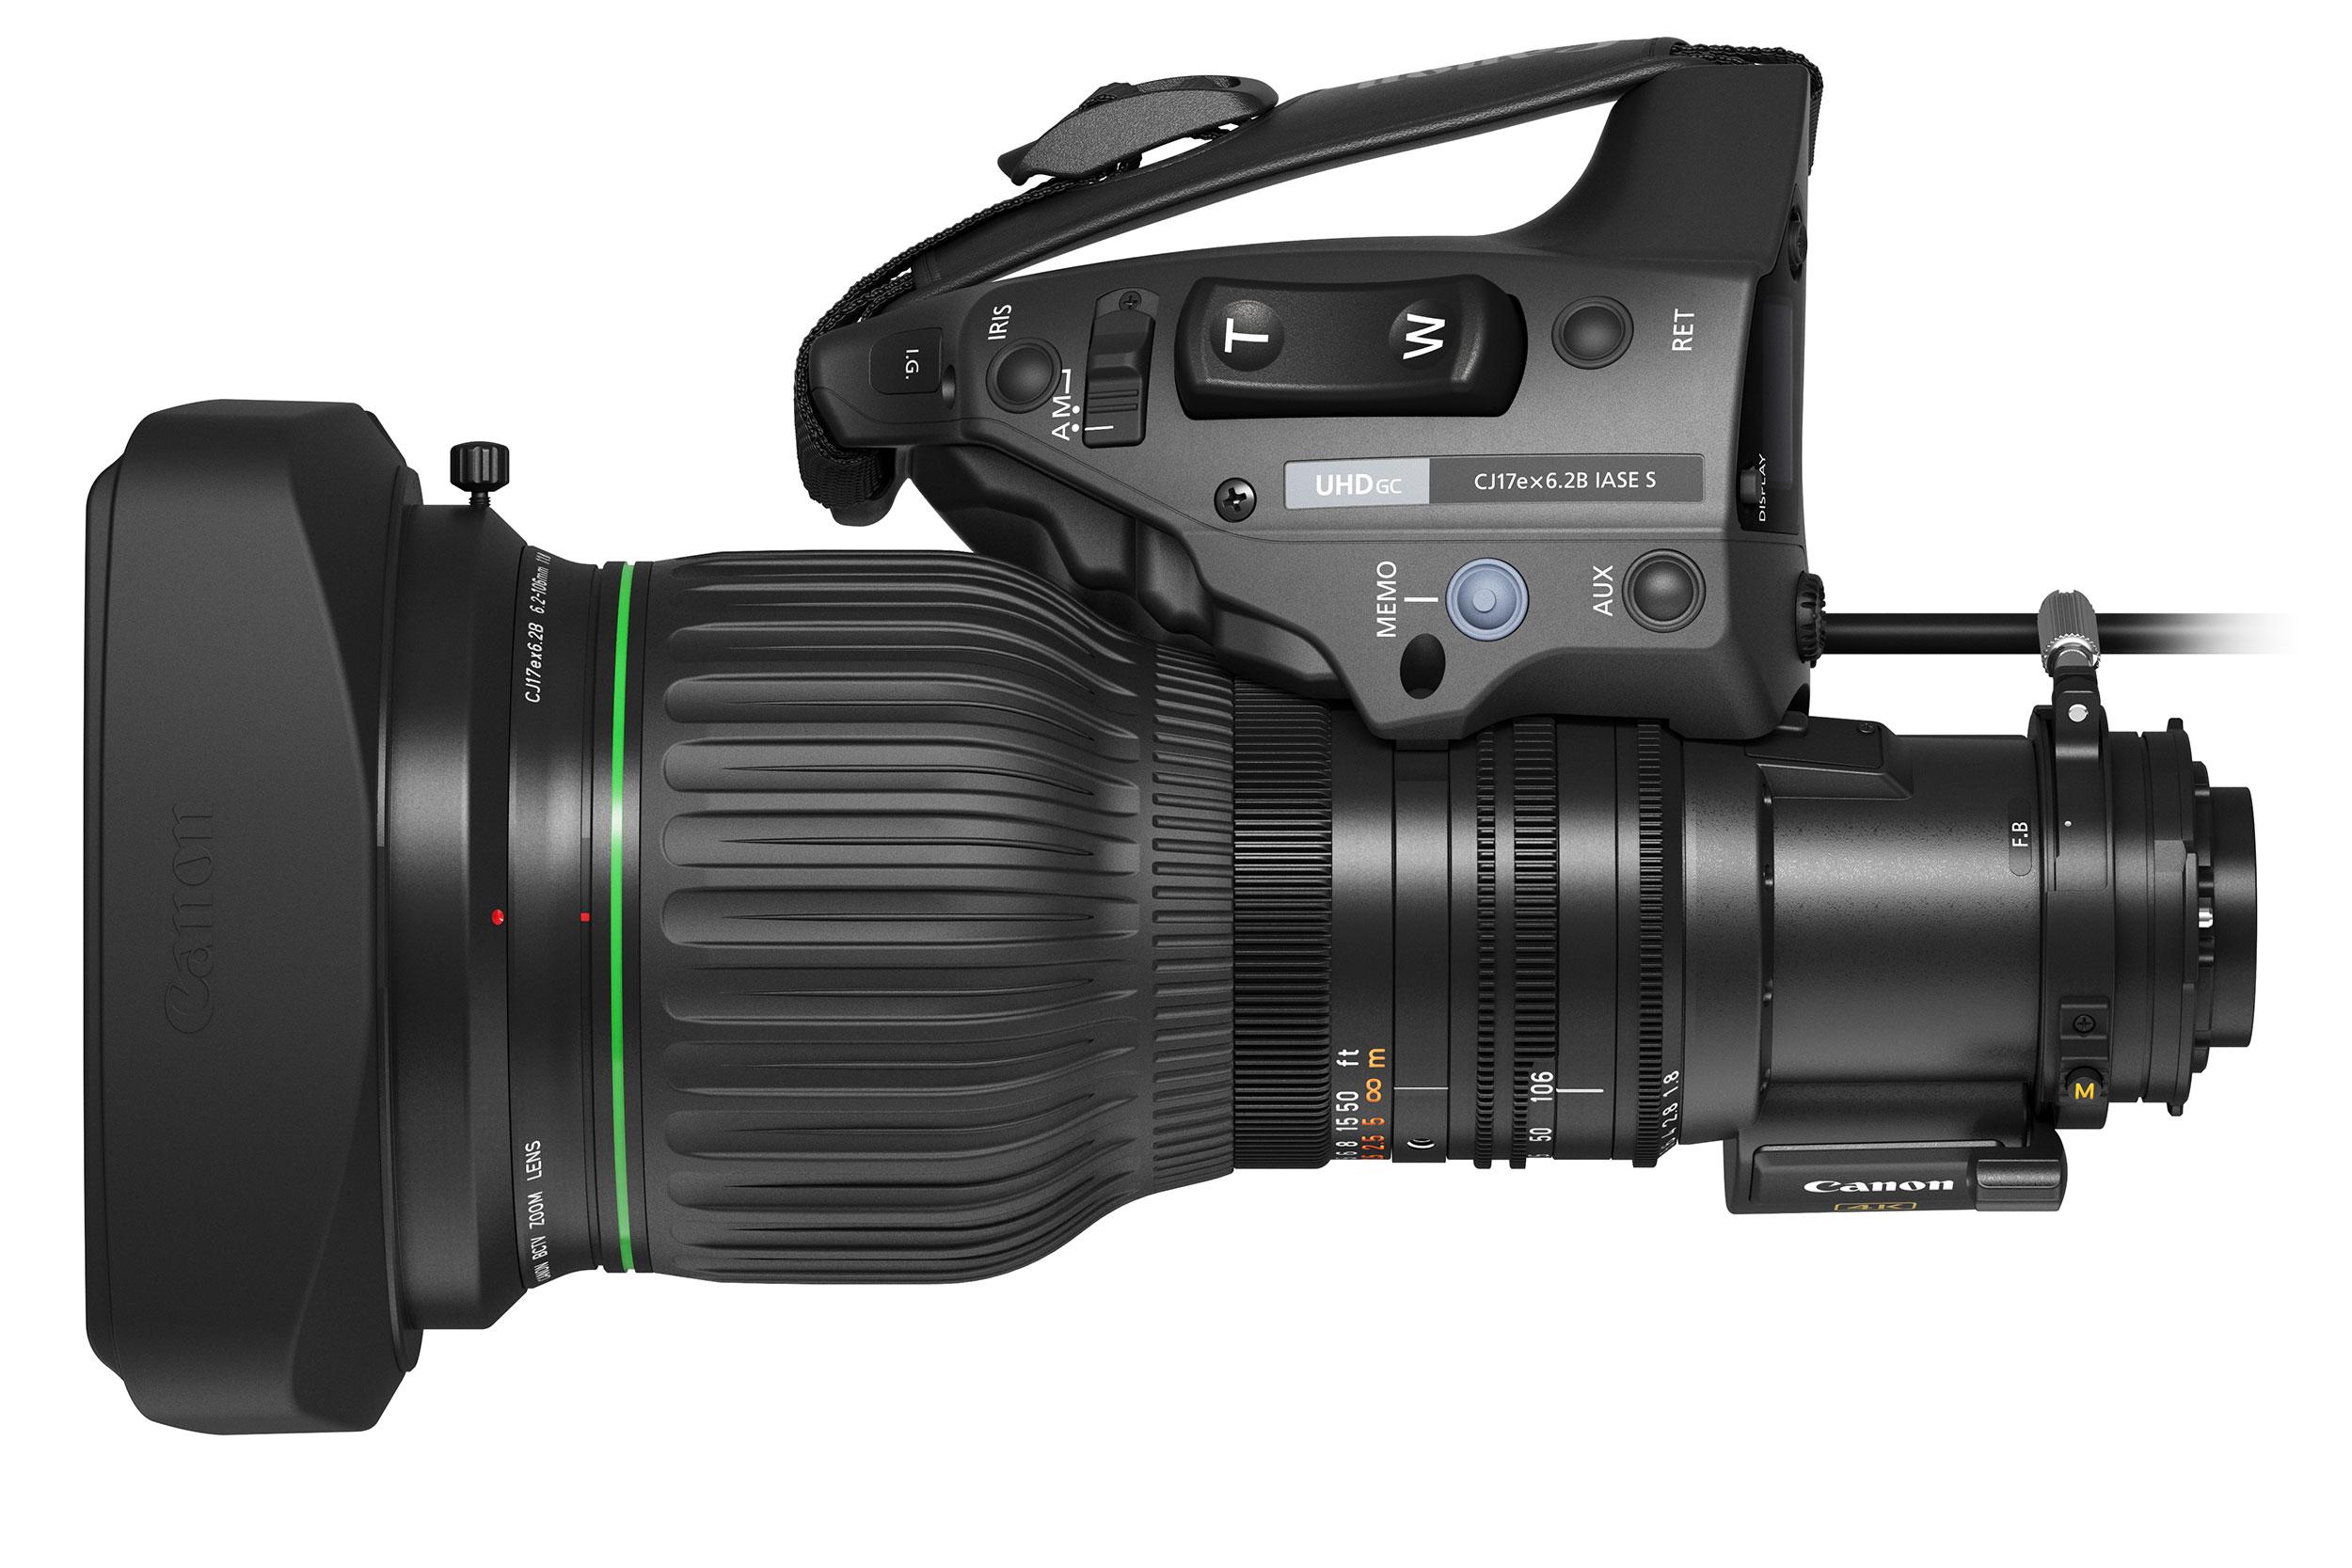 Canon CJ17ex6.2B: a new portable 4K broadcast zoom lens